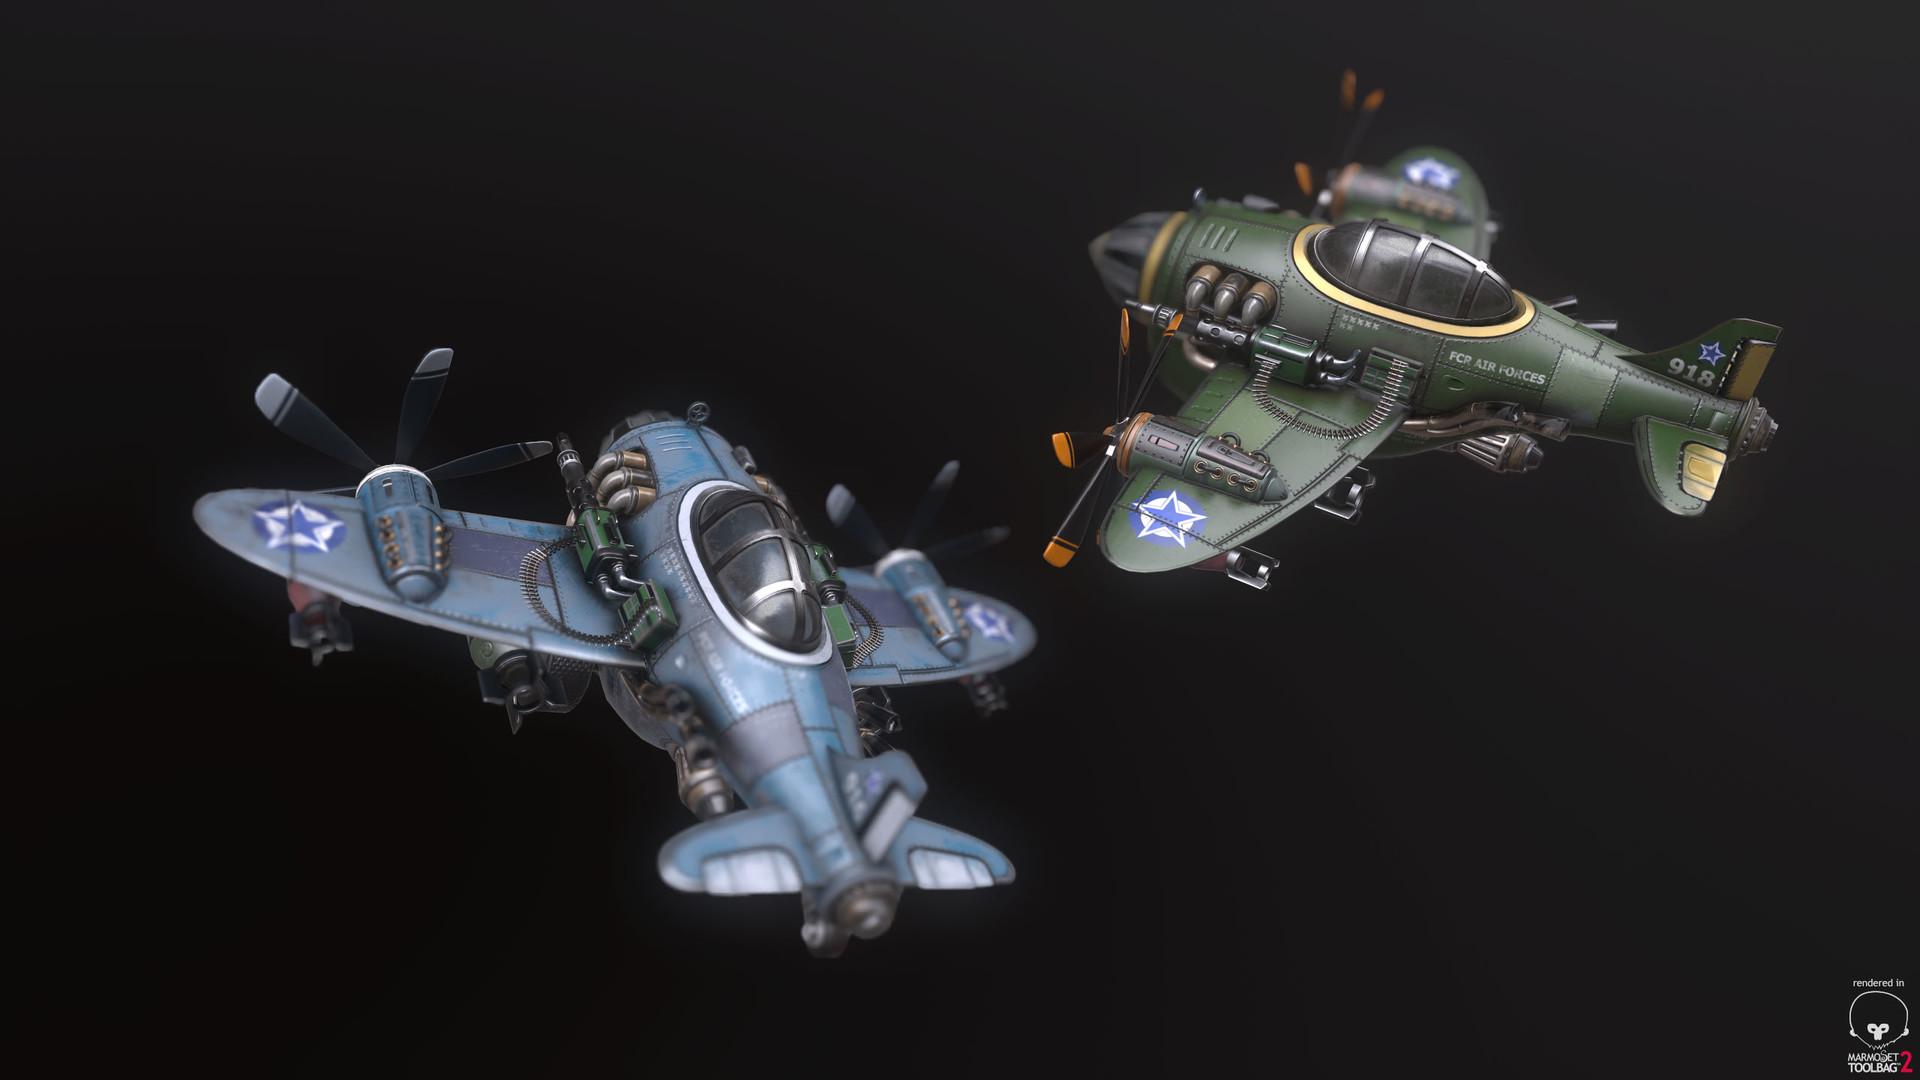 Andrey lukashov planes20